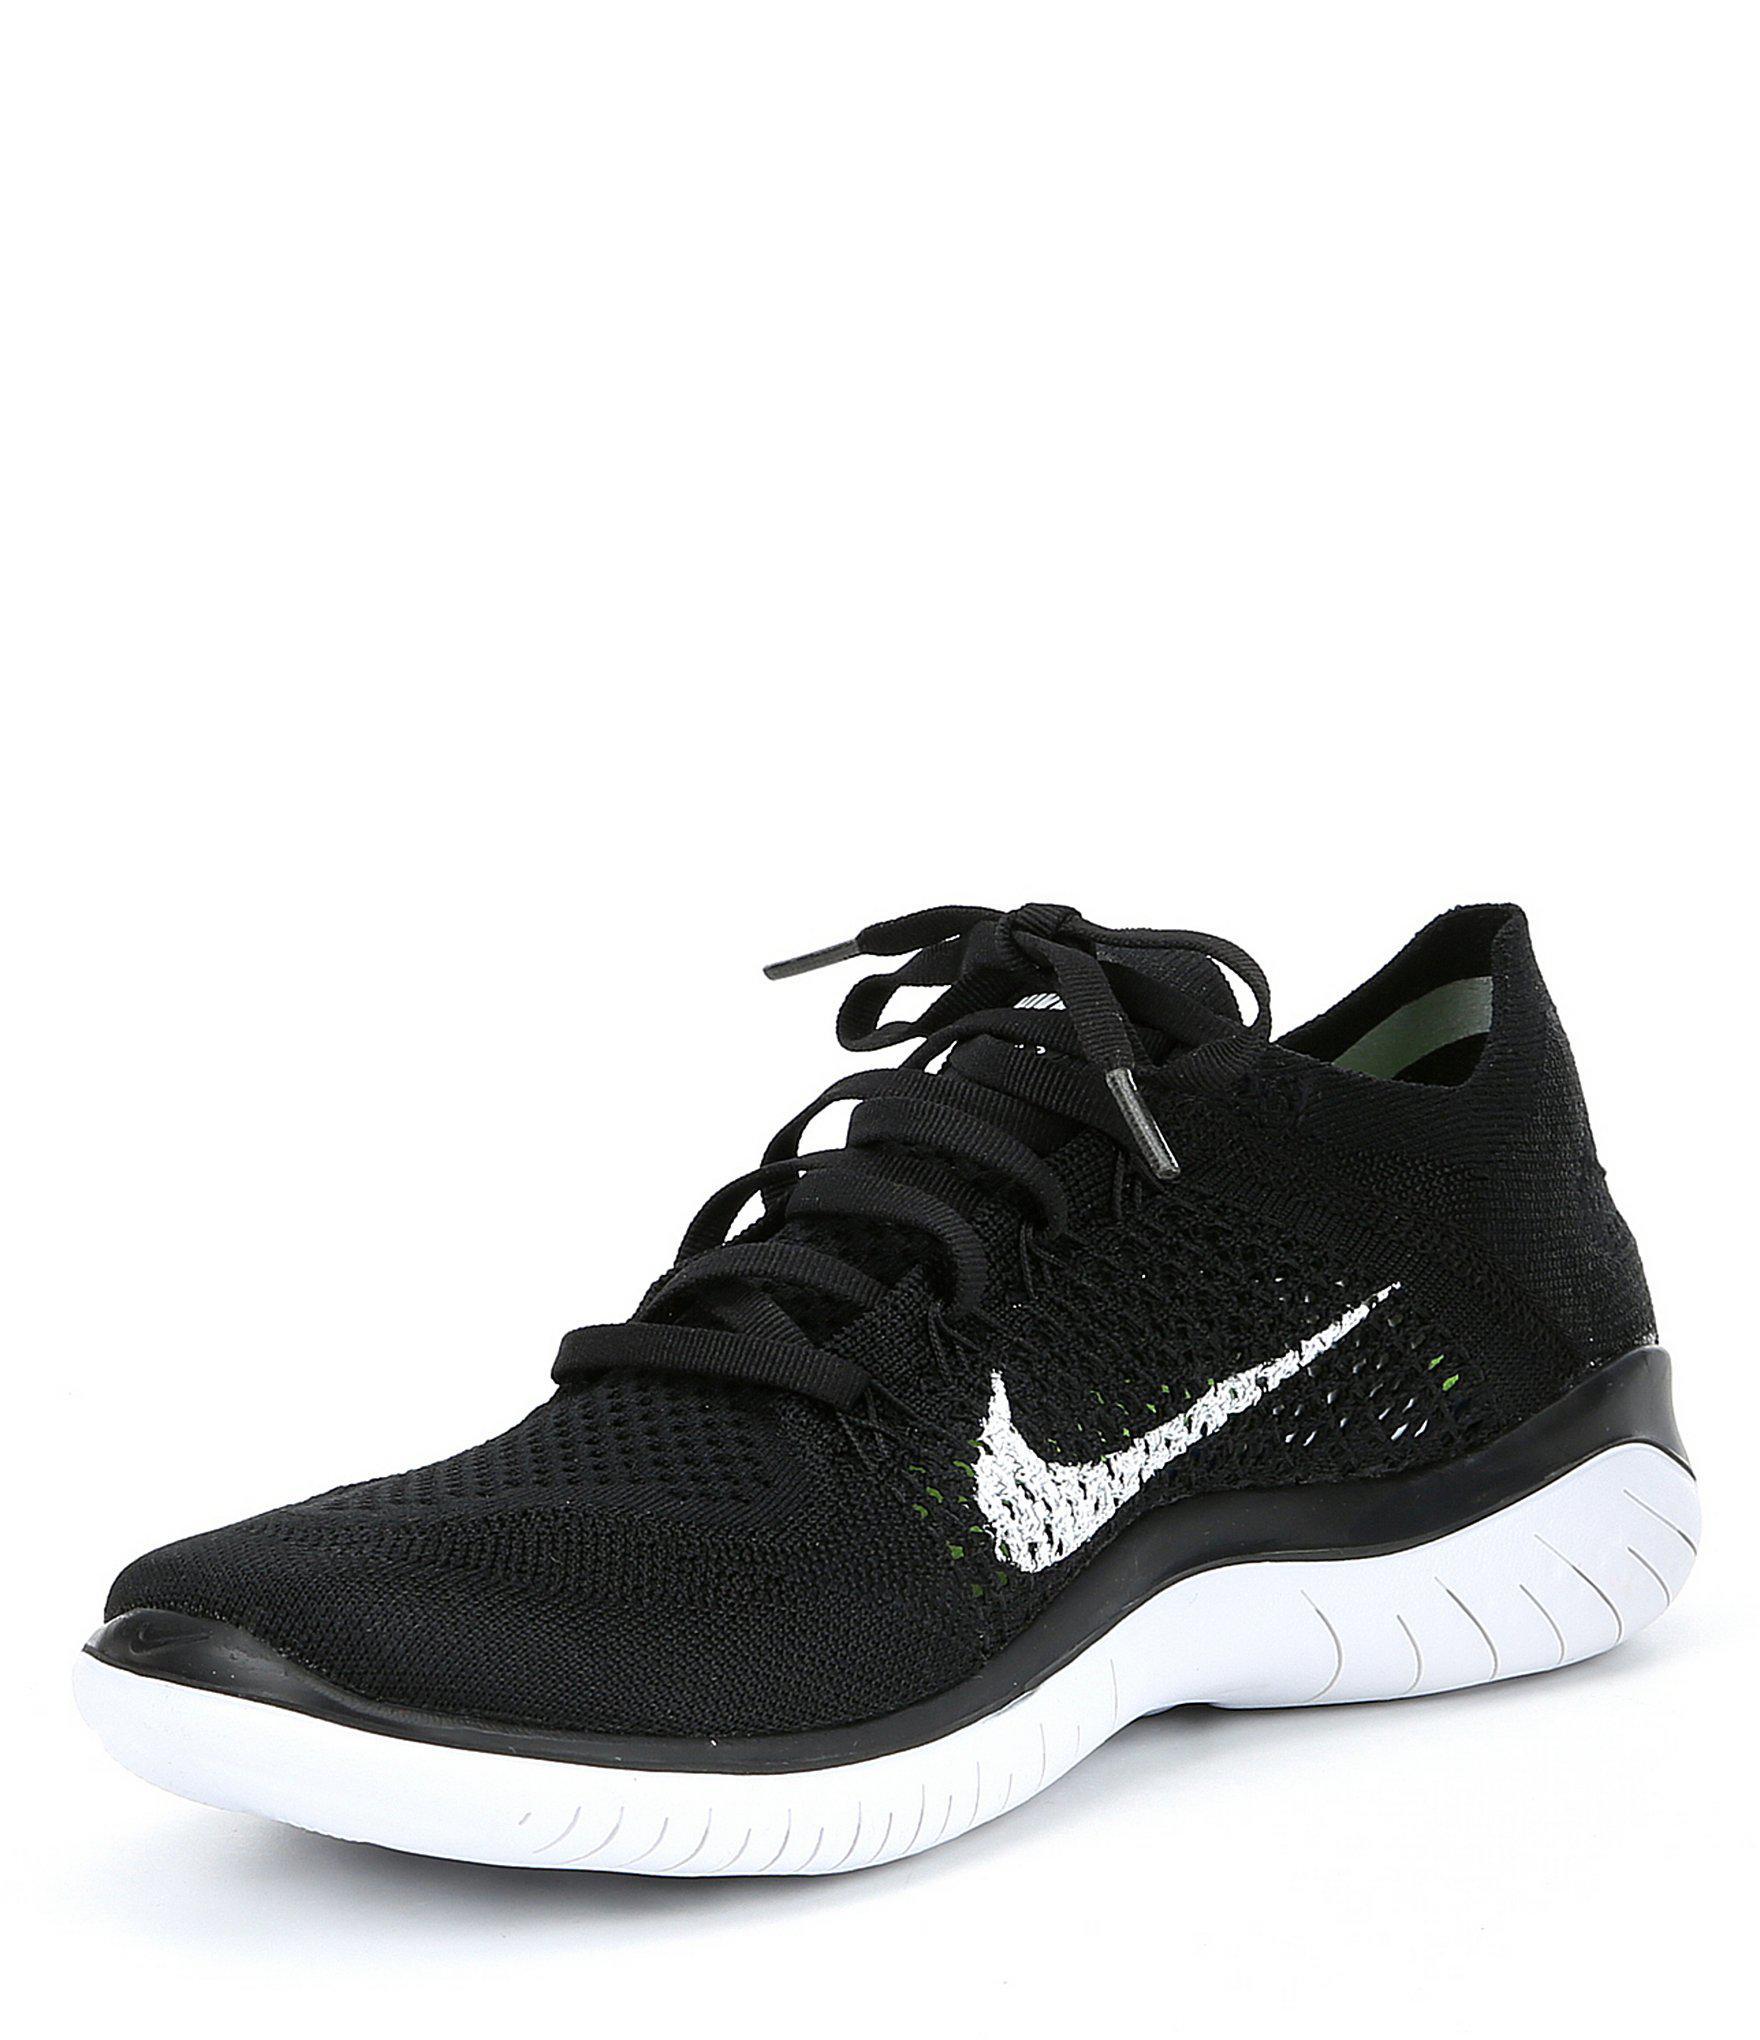 Lyst - Nike Men s Free Rn Flyknit Running Shoes in Black for Men ba09d22a1